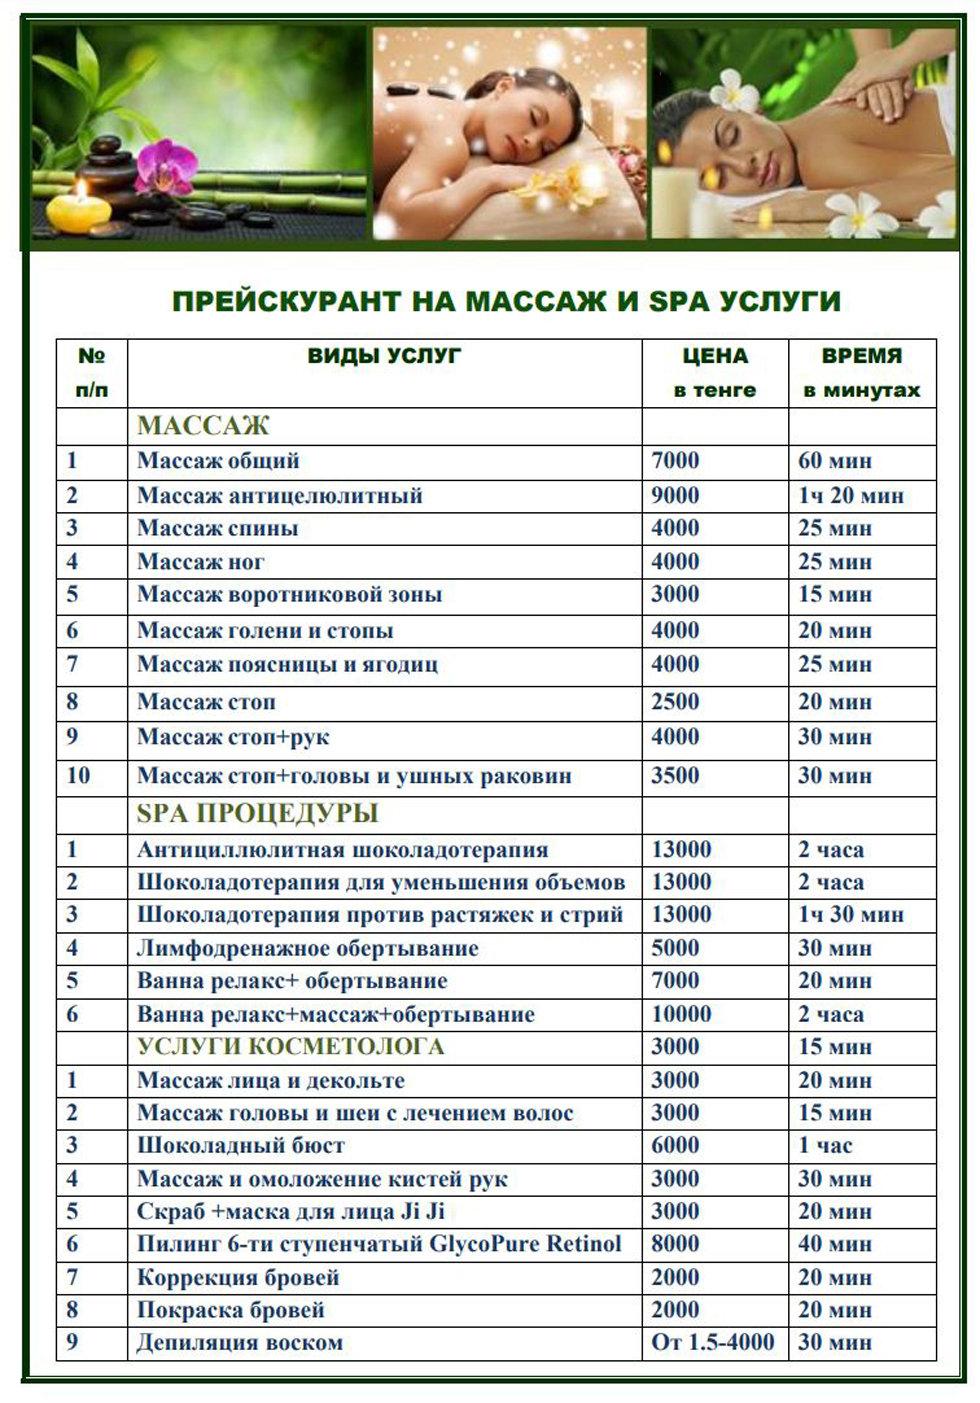 Массаж в Алматы - прайс